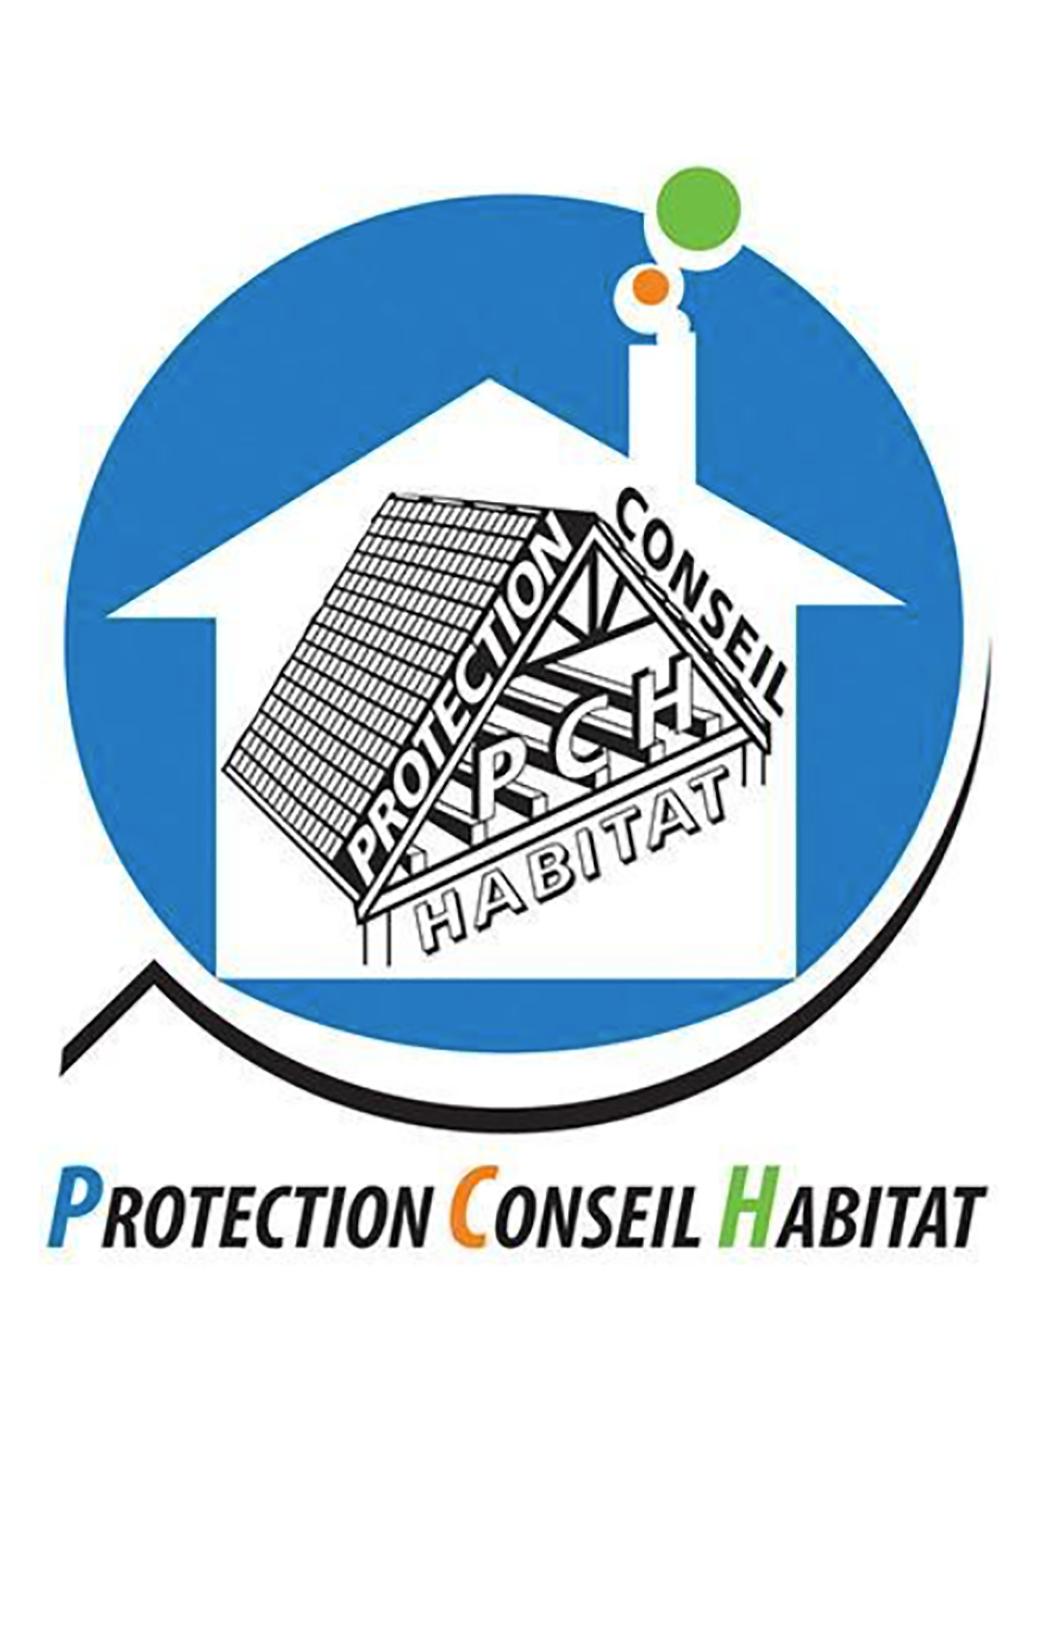 PCH Lorraine - Protection - Conseil - Habitat